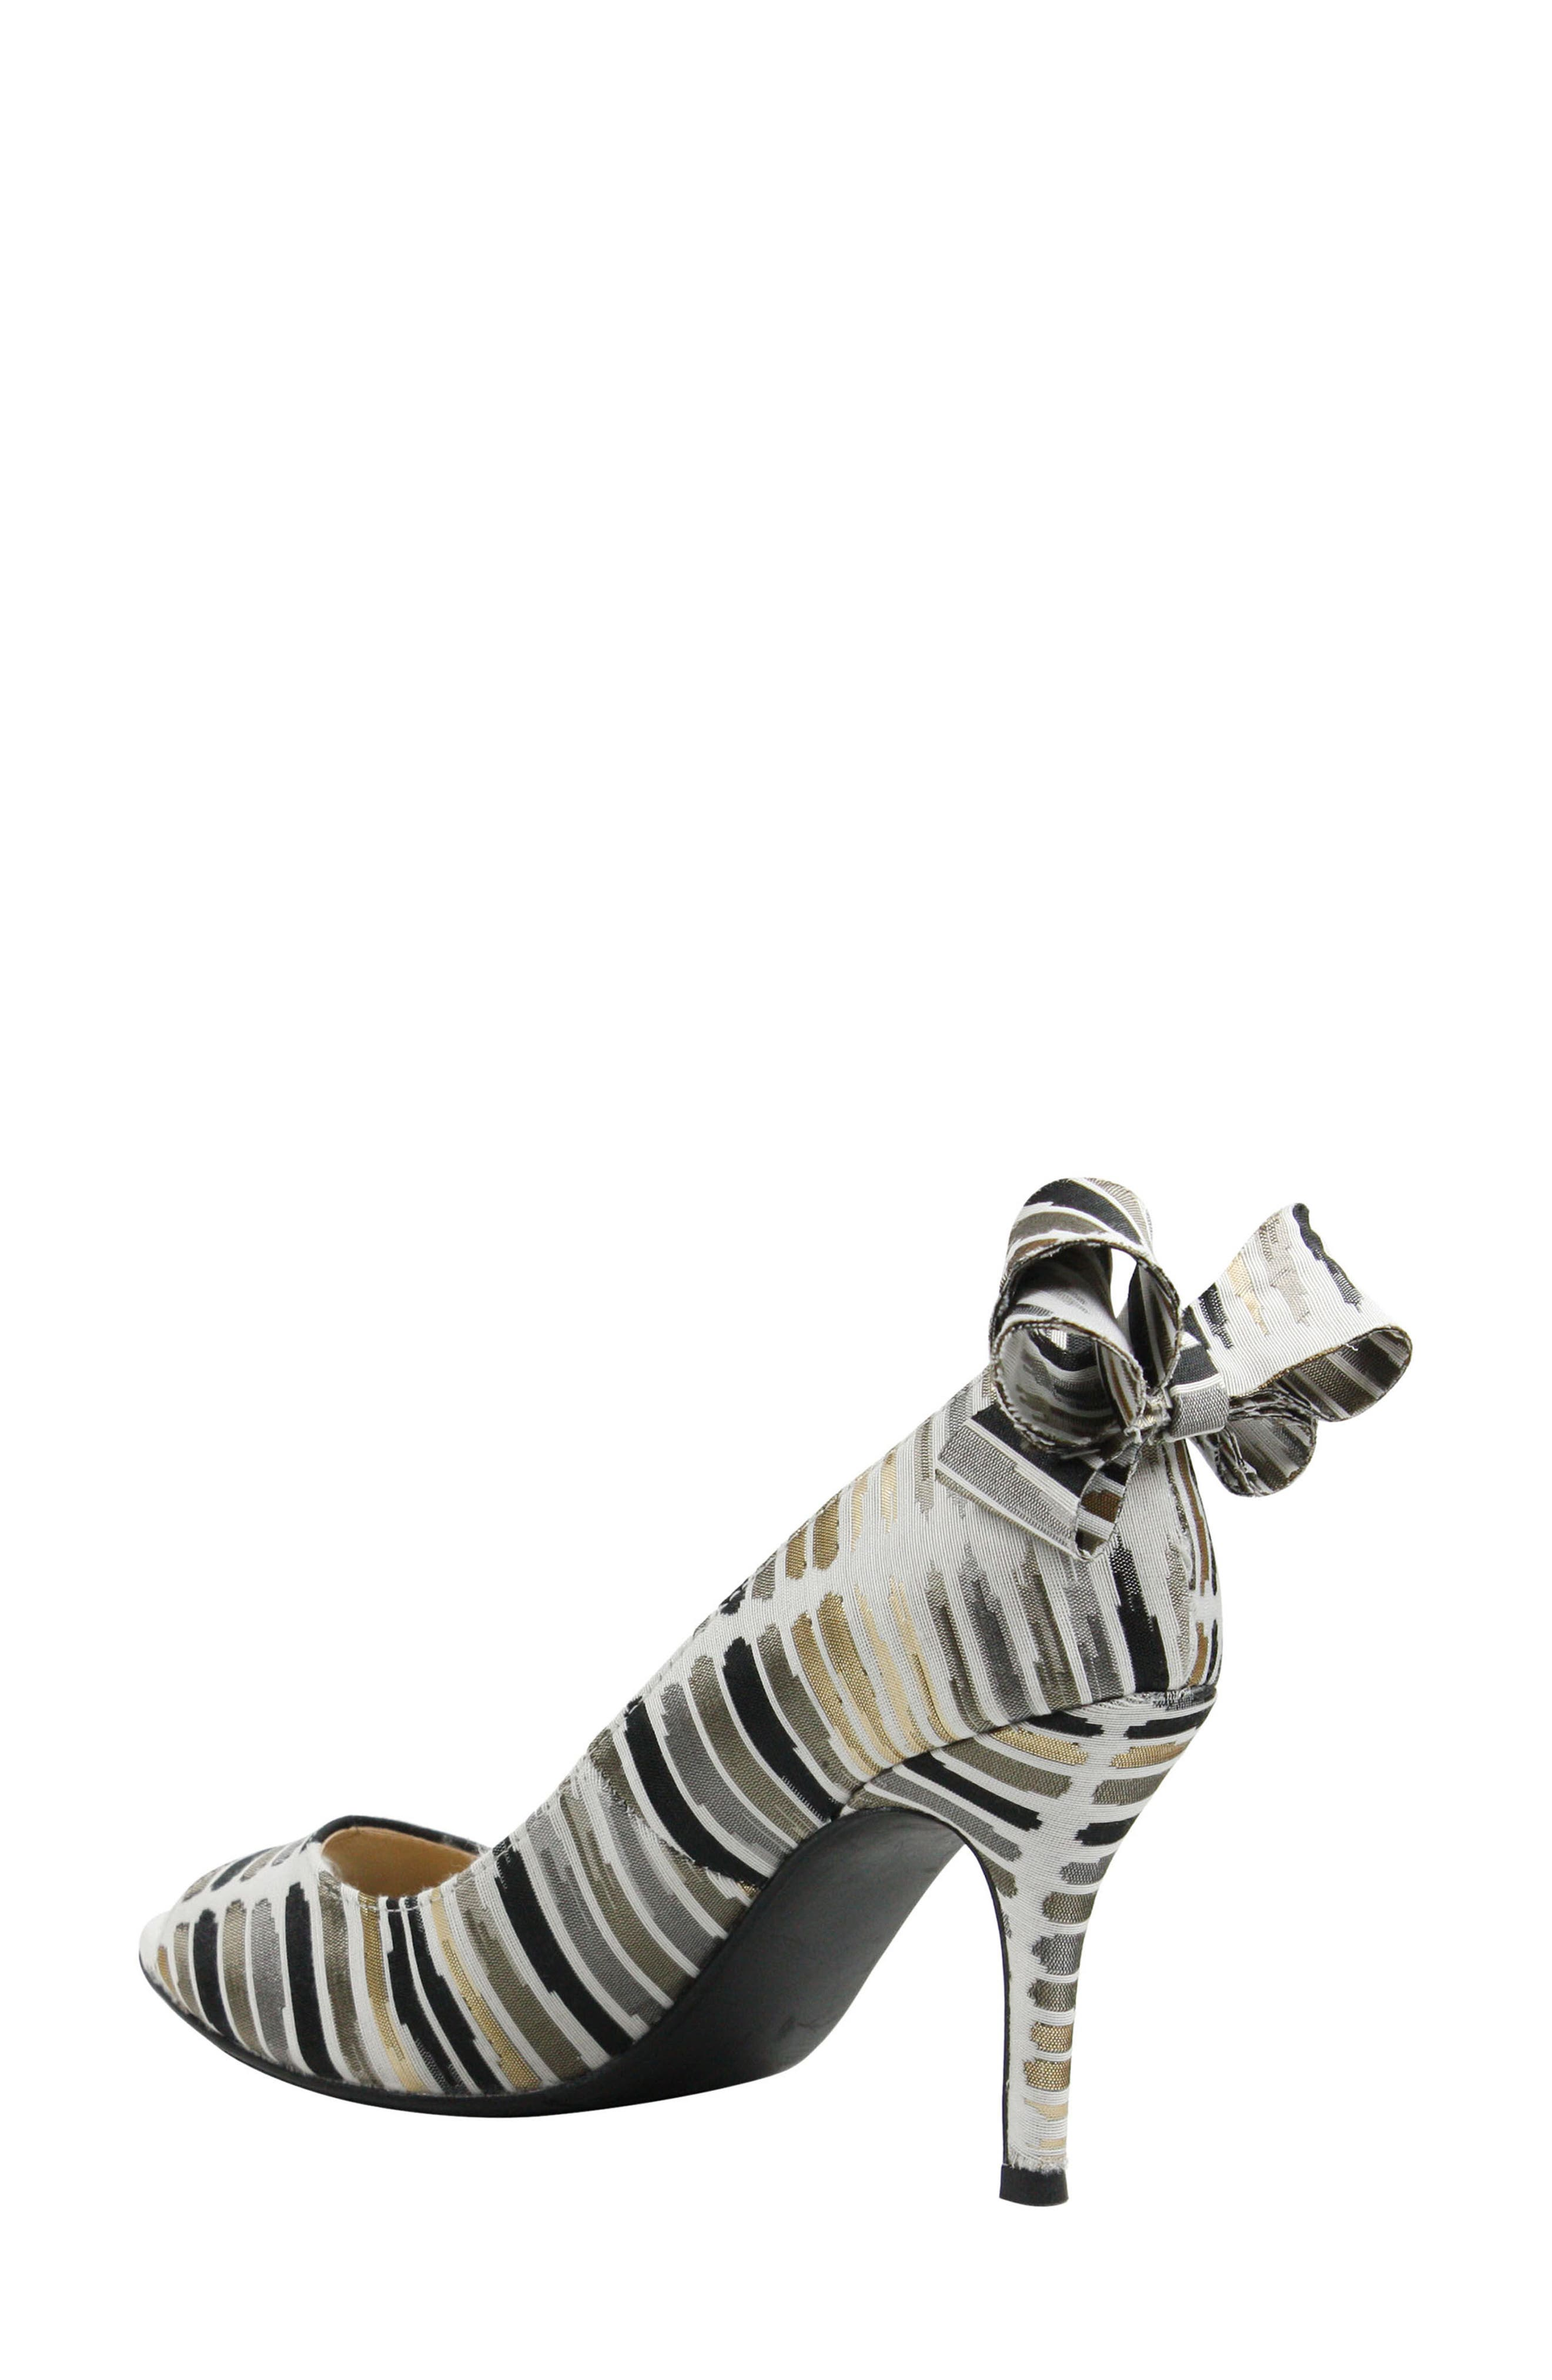 Ellasee Bow Peep Toe Pump,                             Alternate thumbnail 2, color,                             Cream/ Black/ Gold Fabric